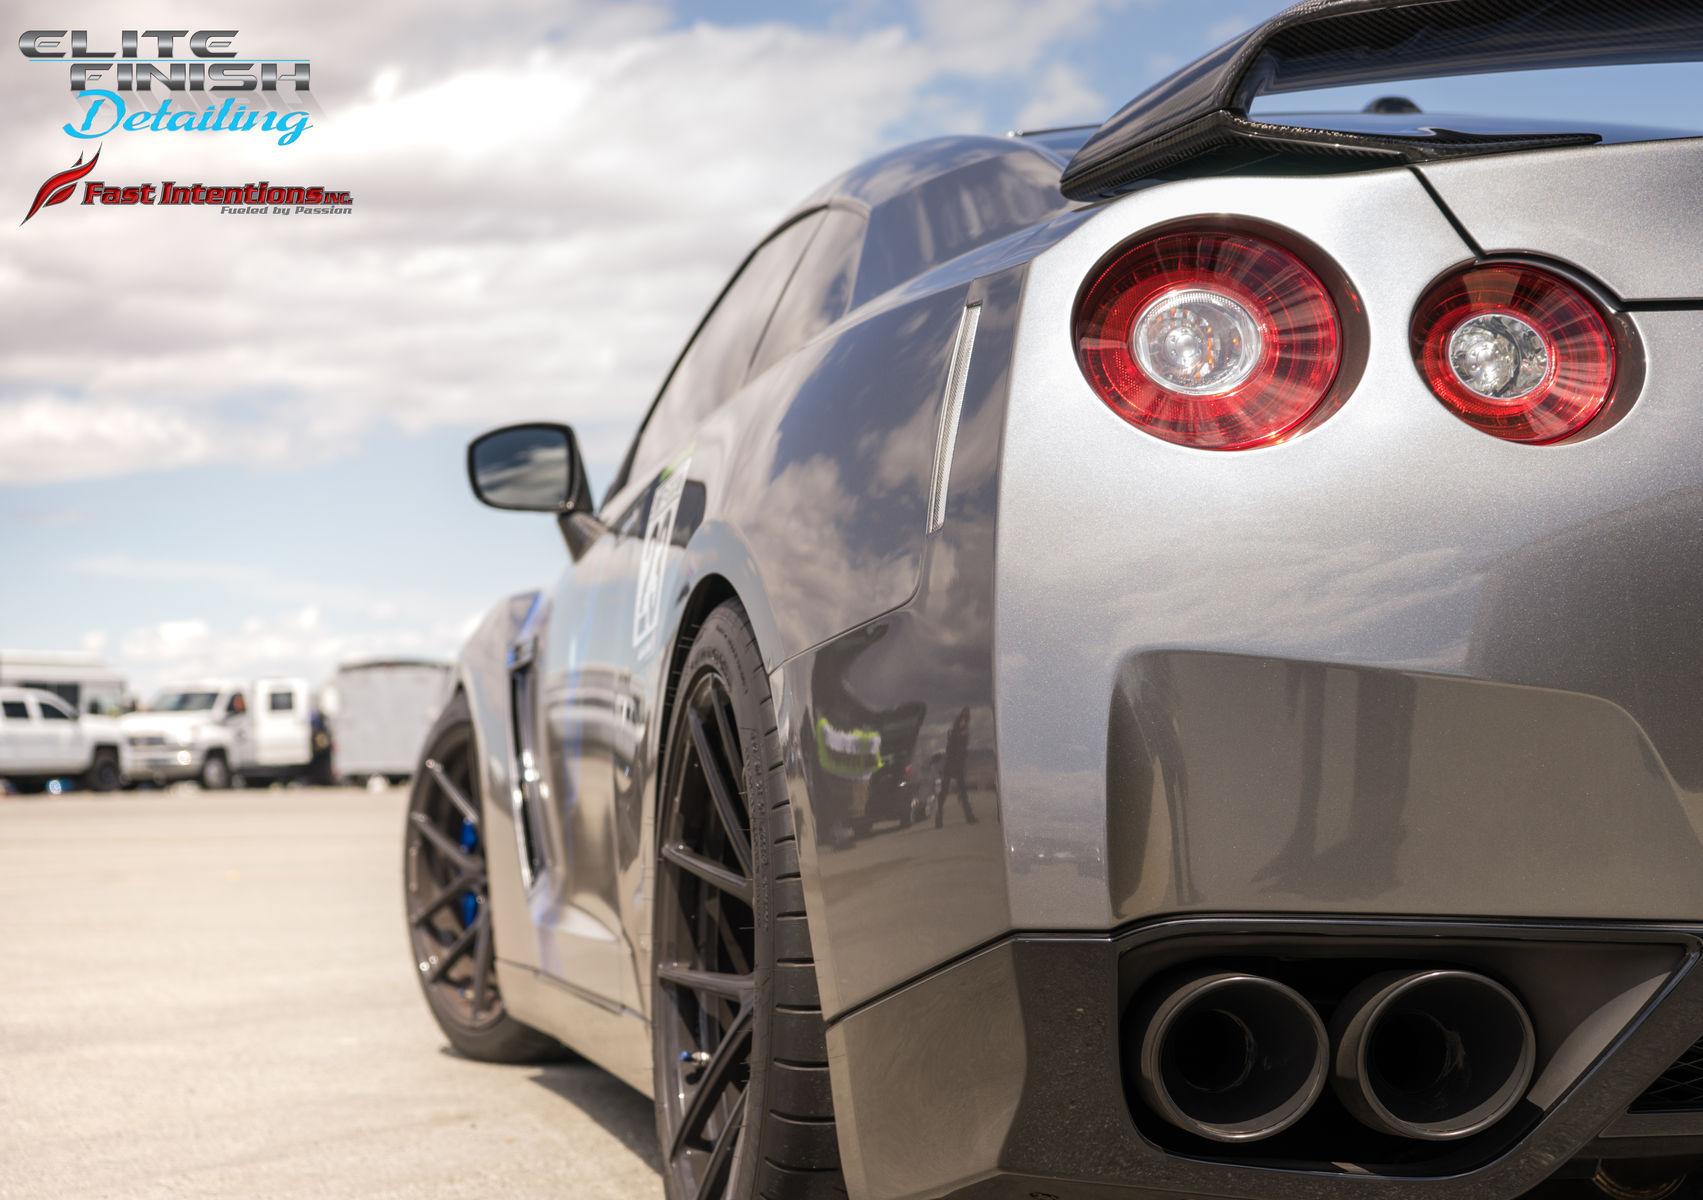 Nissan GT-R   Shift S3ctor California Airstrip Attack